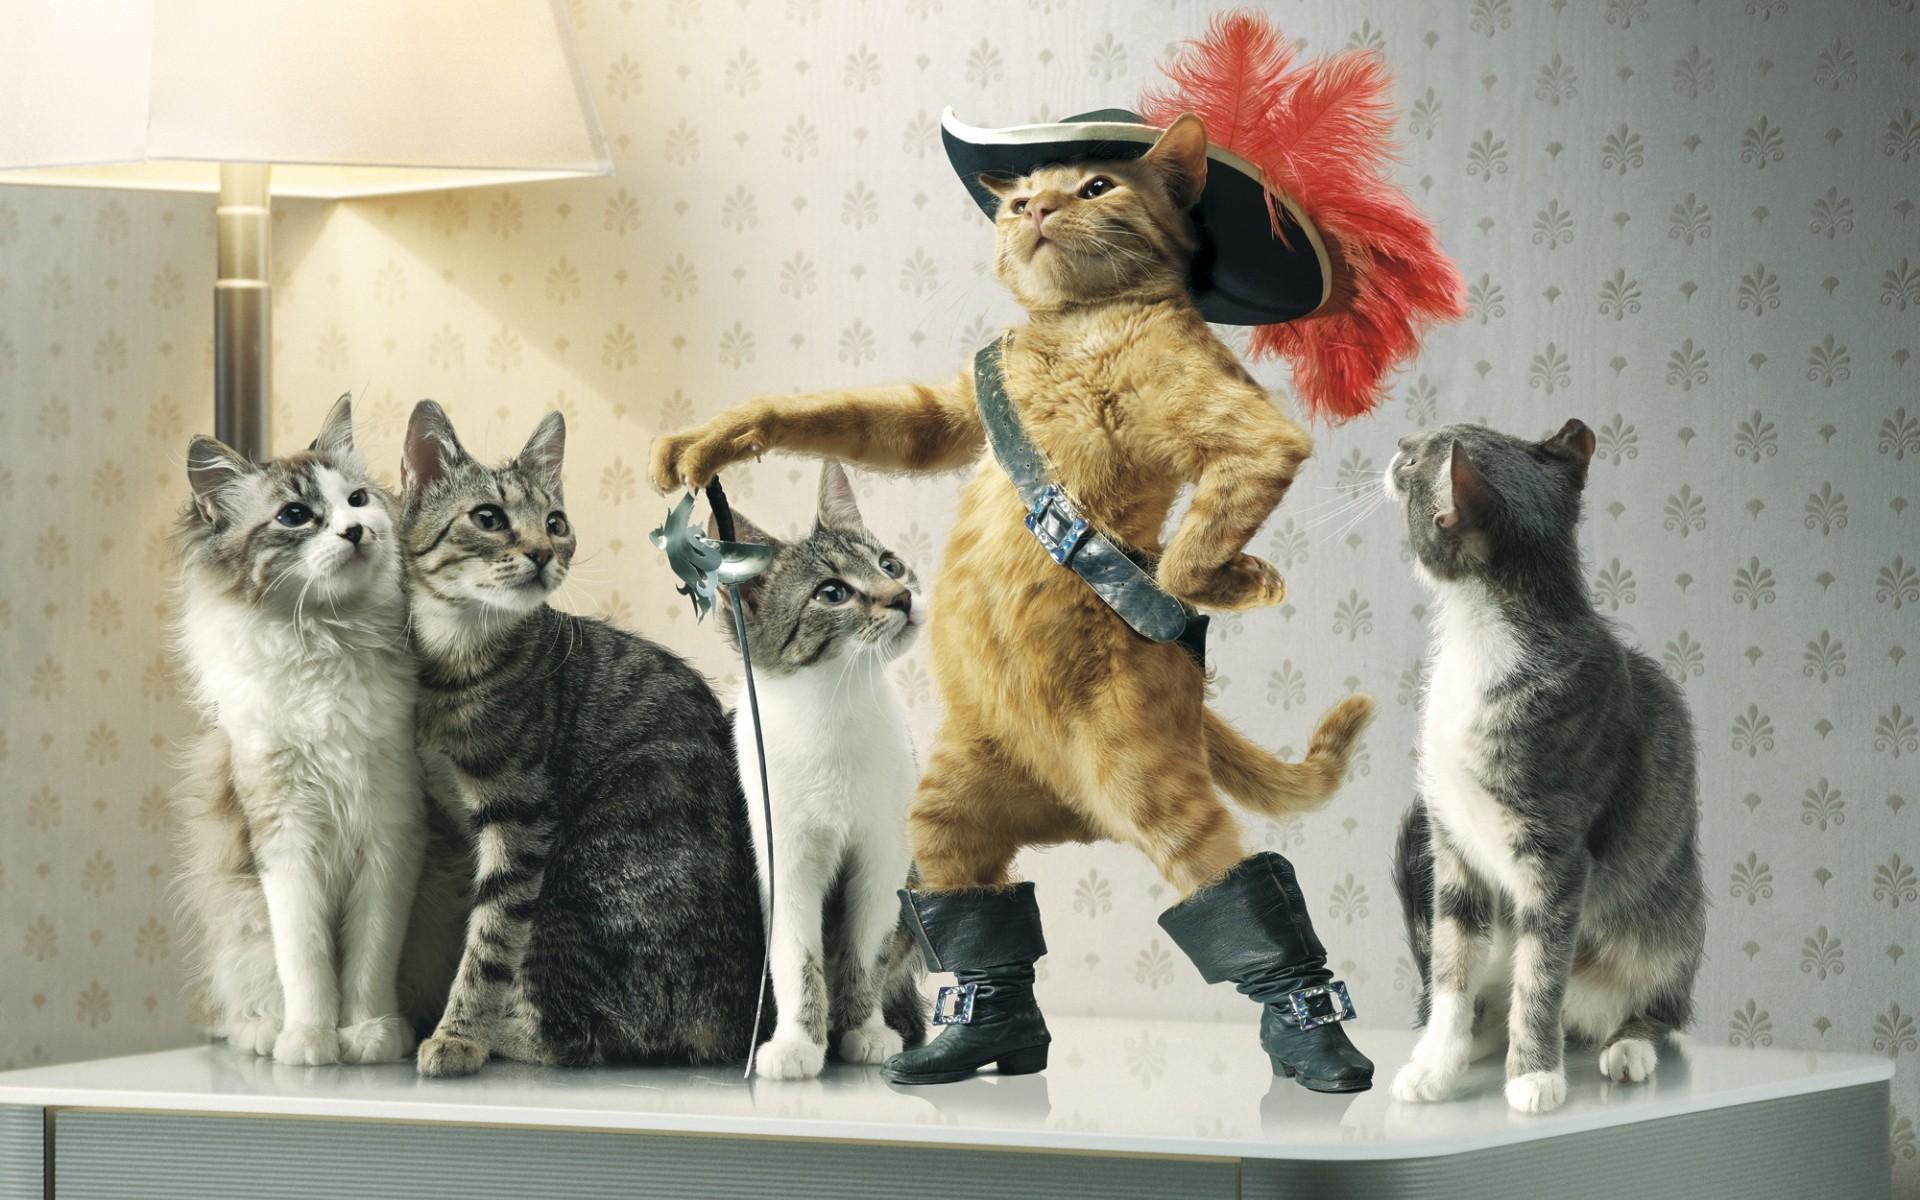 General 1920x1200 cats animals Puss in Boots Raiden humor